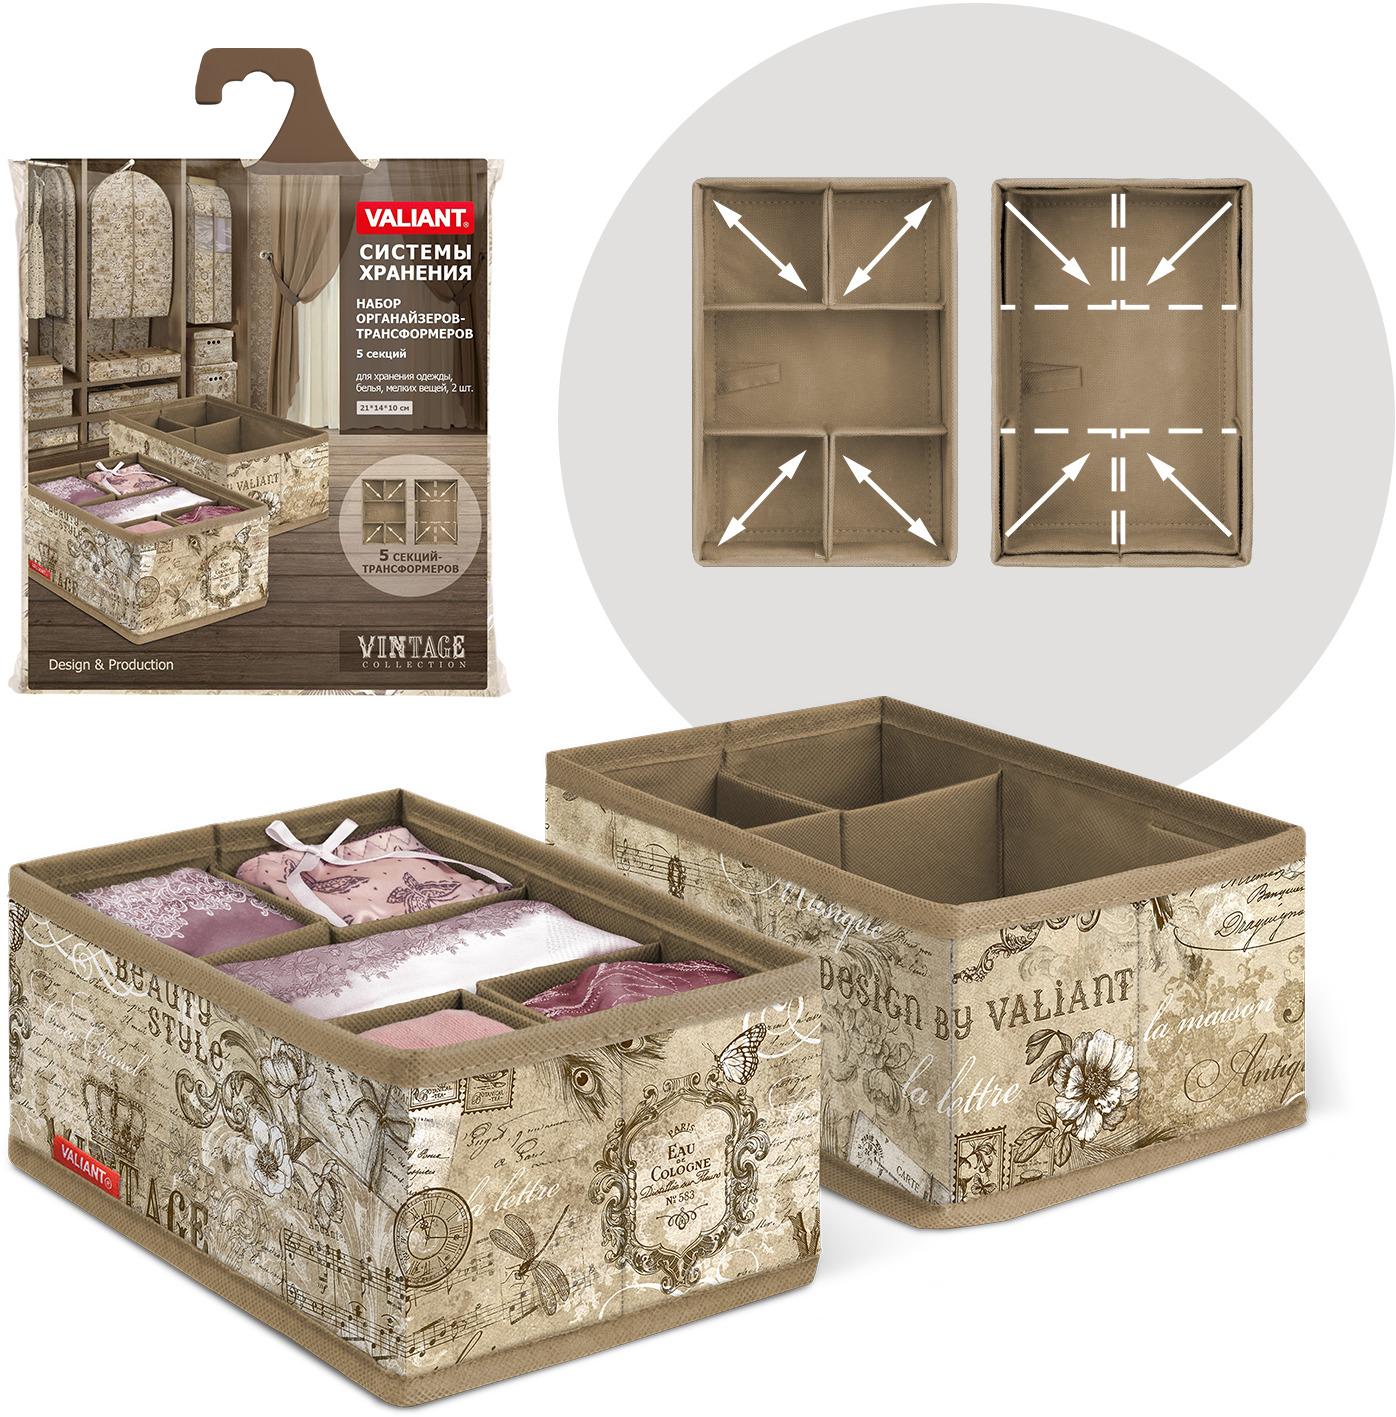 Коробка для хранения вещей Valiant Vintage, цвет: бежевый, 21 х 14 х 10 см коробка для хранения valiant travelling складная 25 х 33 х 18 5 см 2 шт